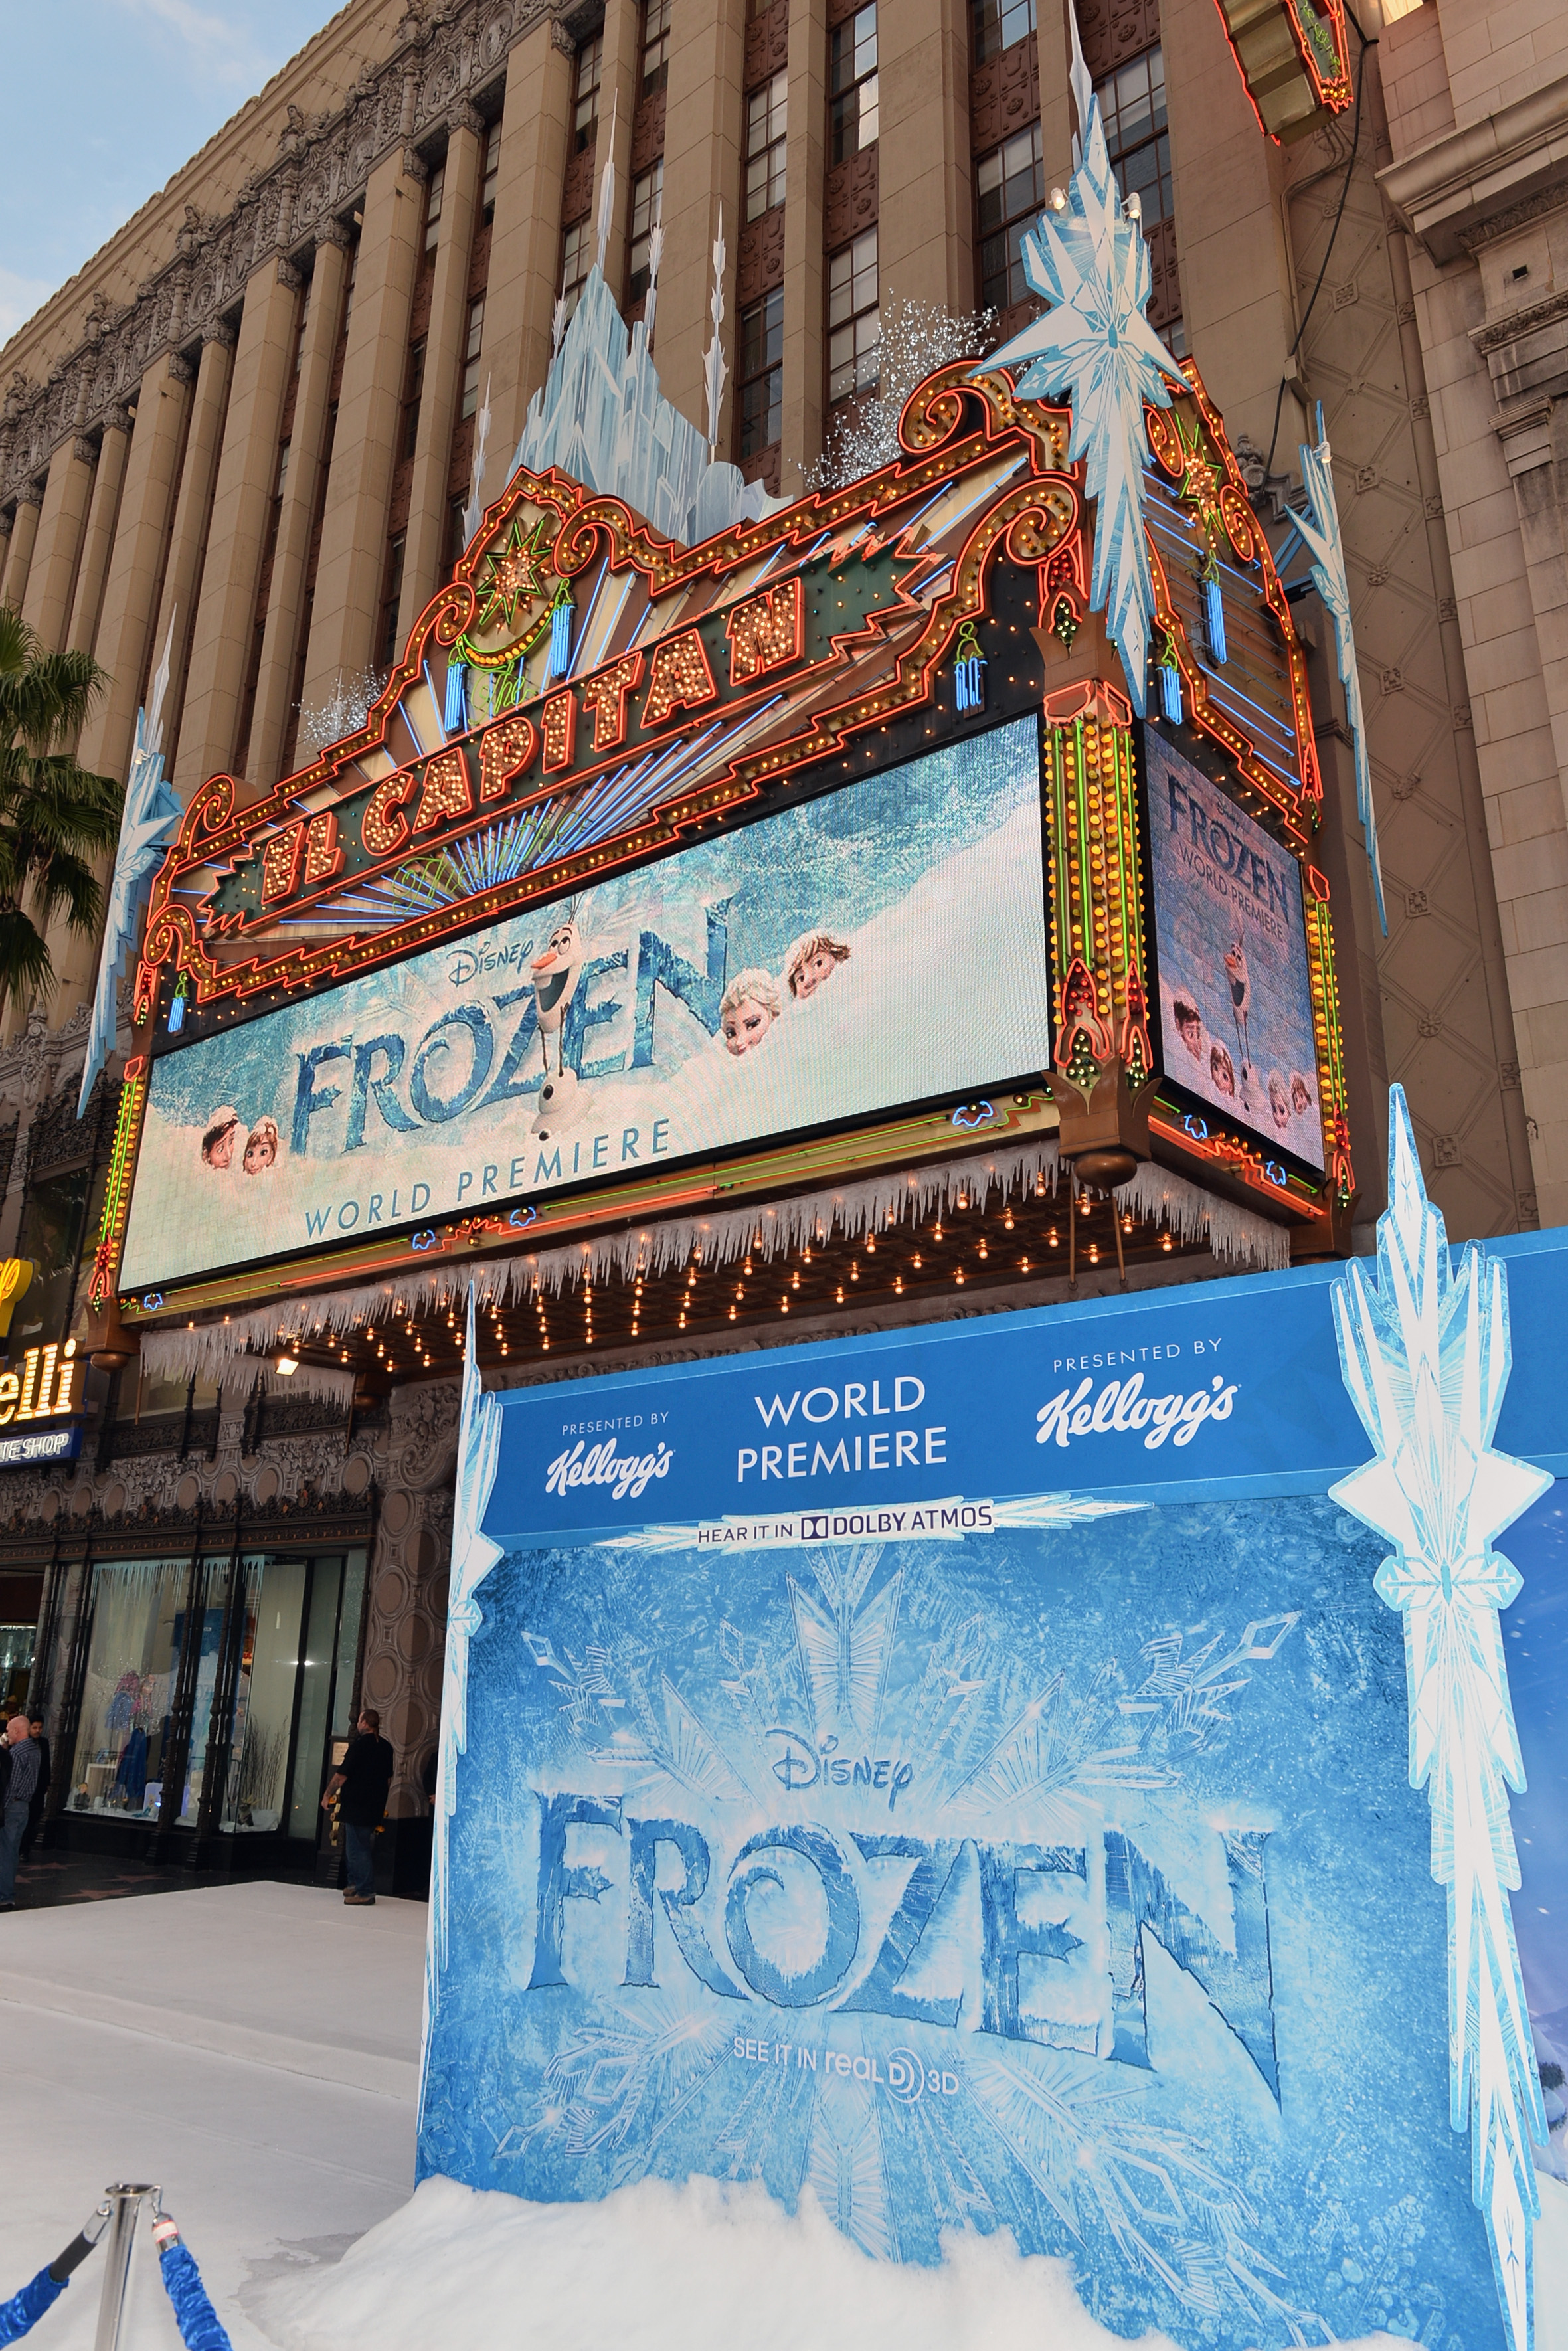 Disney Frozen Premiere At El Capitan Theater